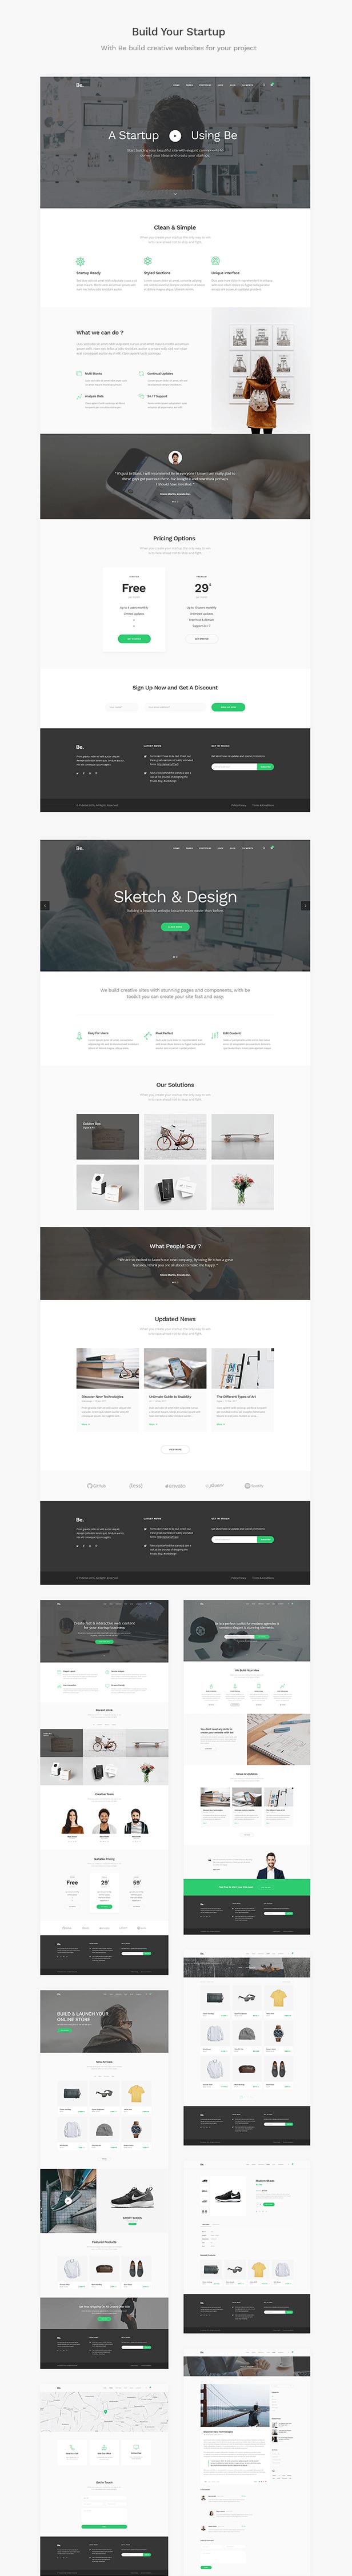 BoTheme - Startup Business WordPress Theme - 12